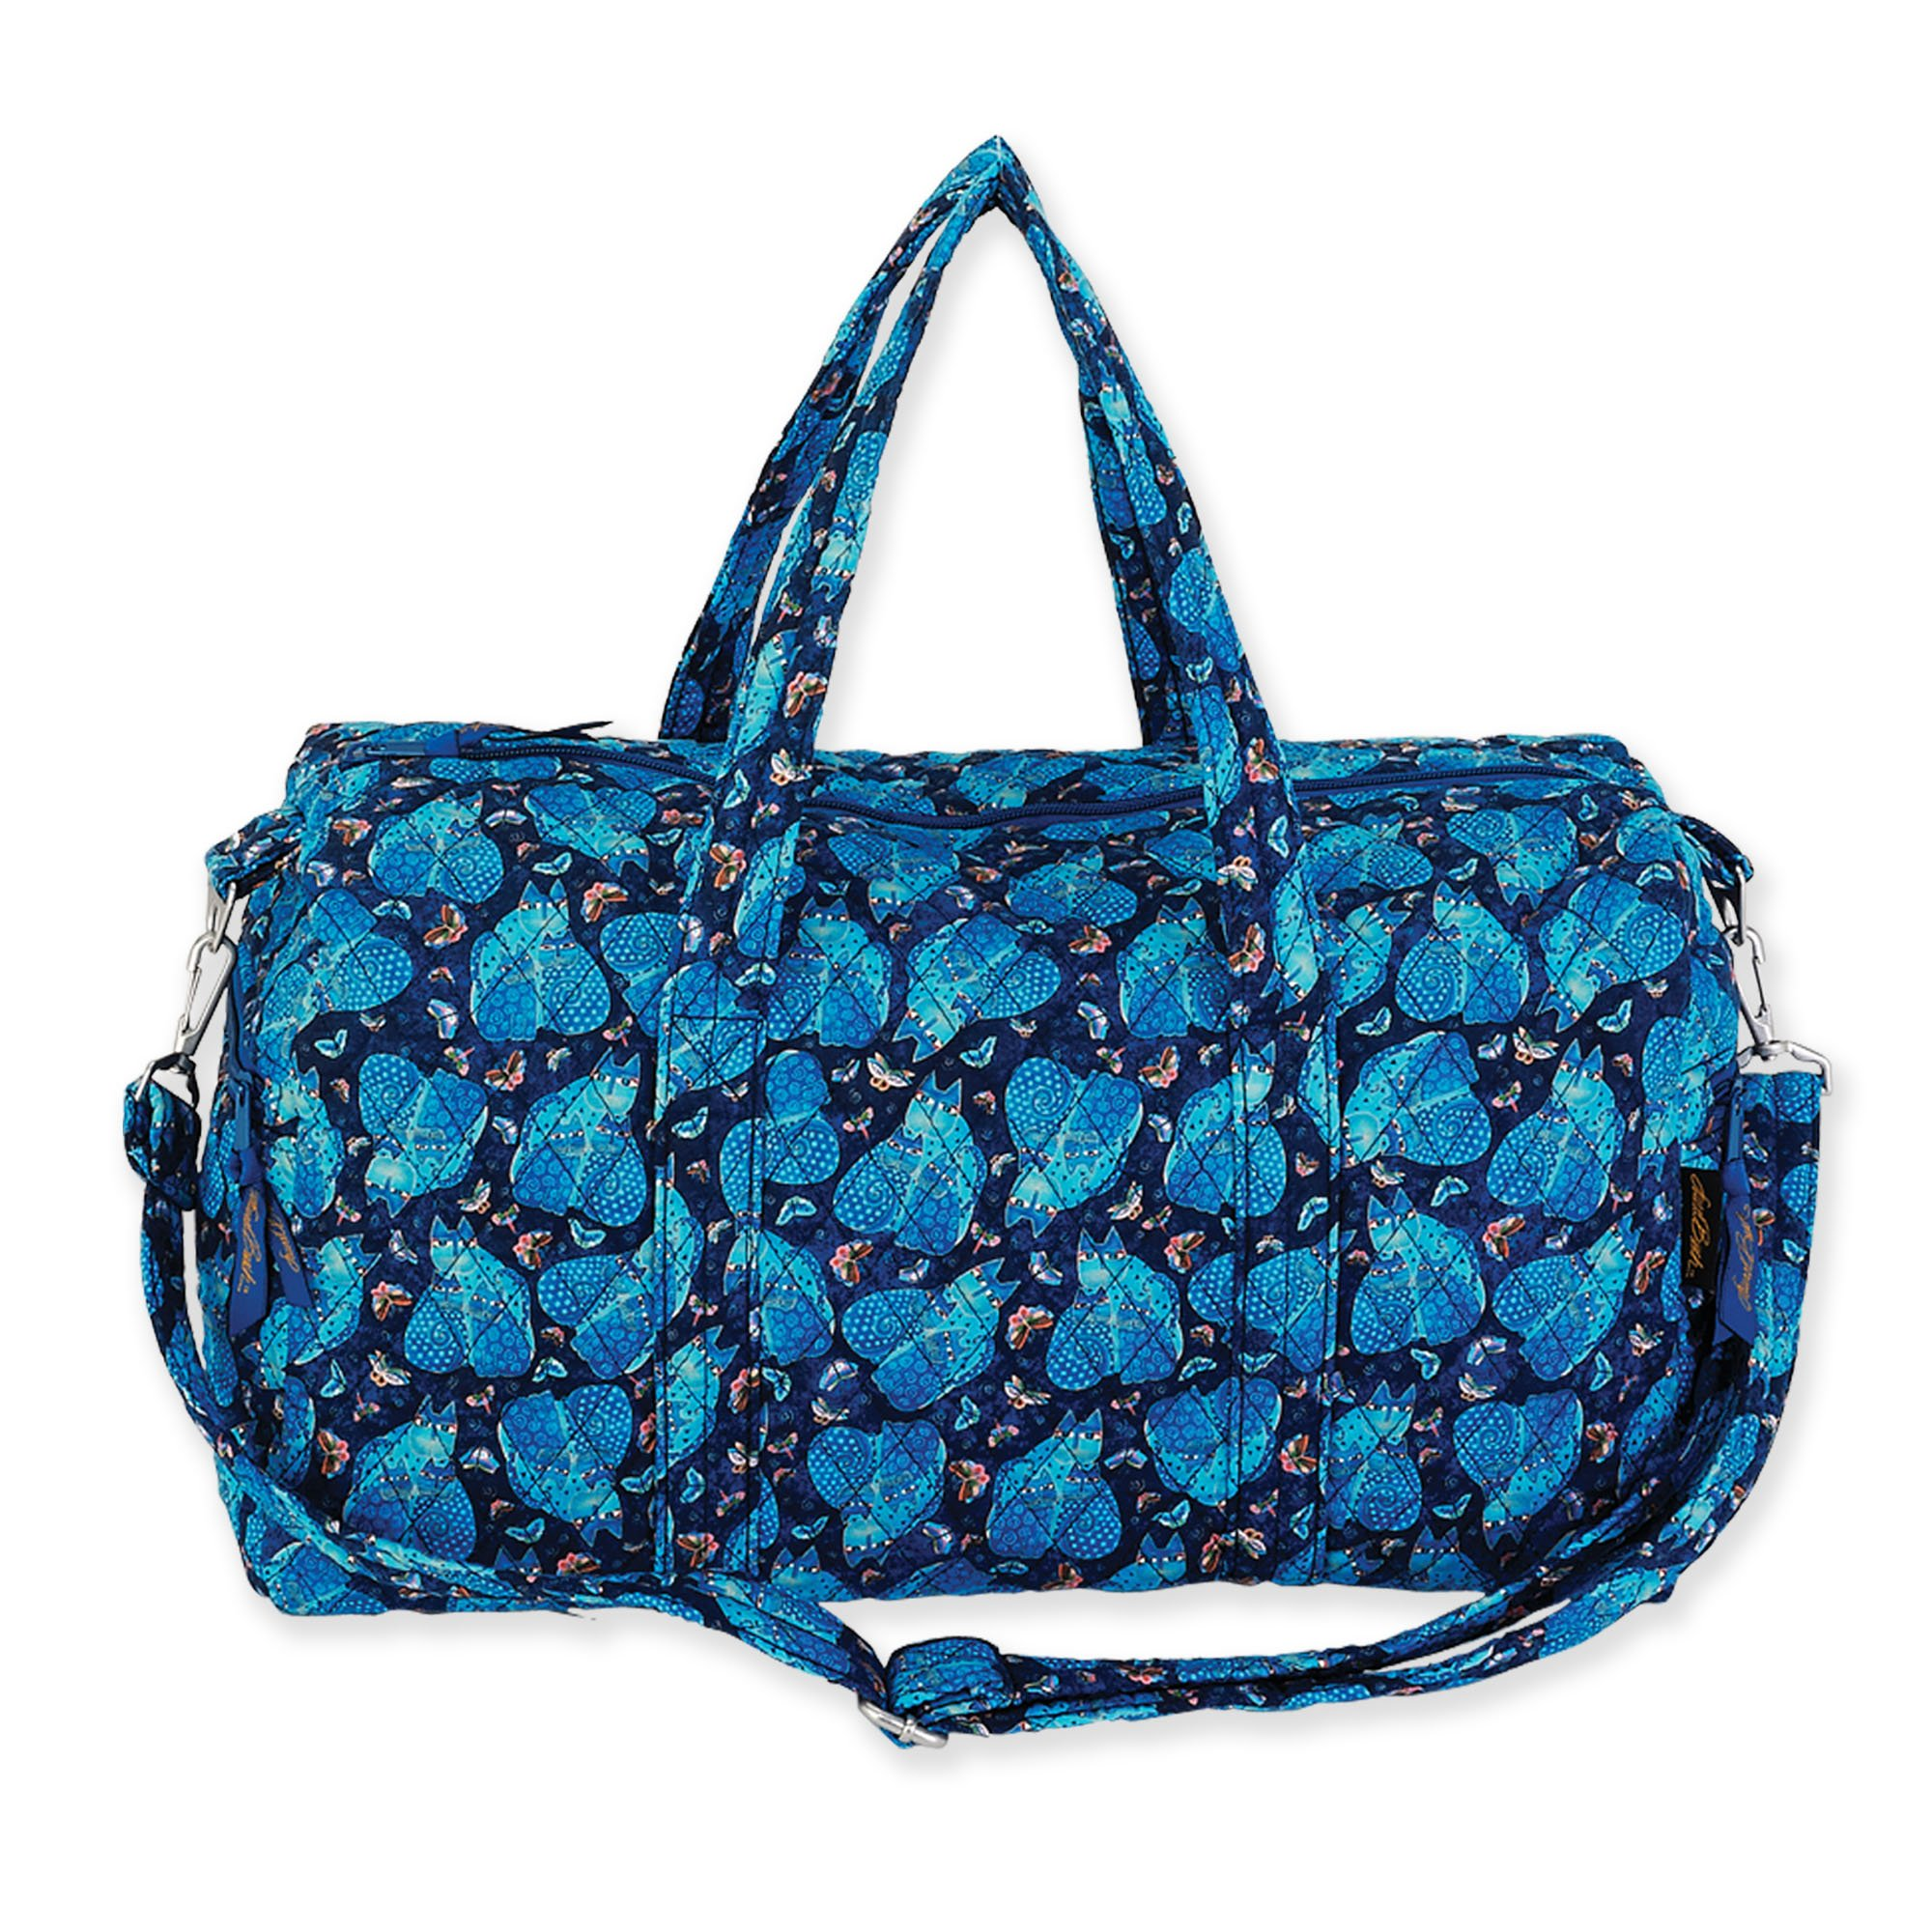 Laurel Burch Indigo Cats Weekender Travel Bag (Blue)